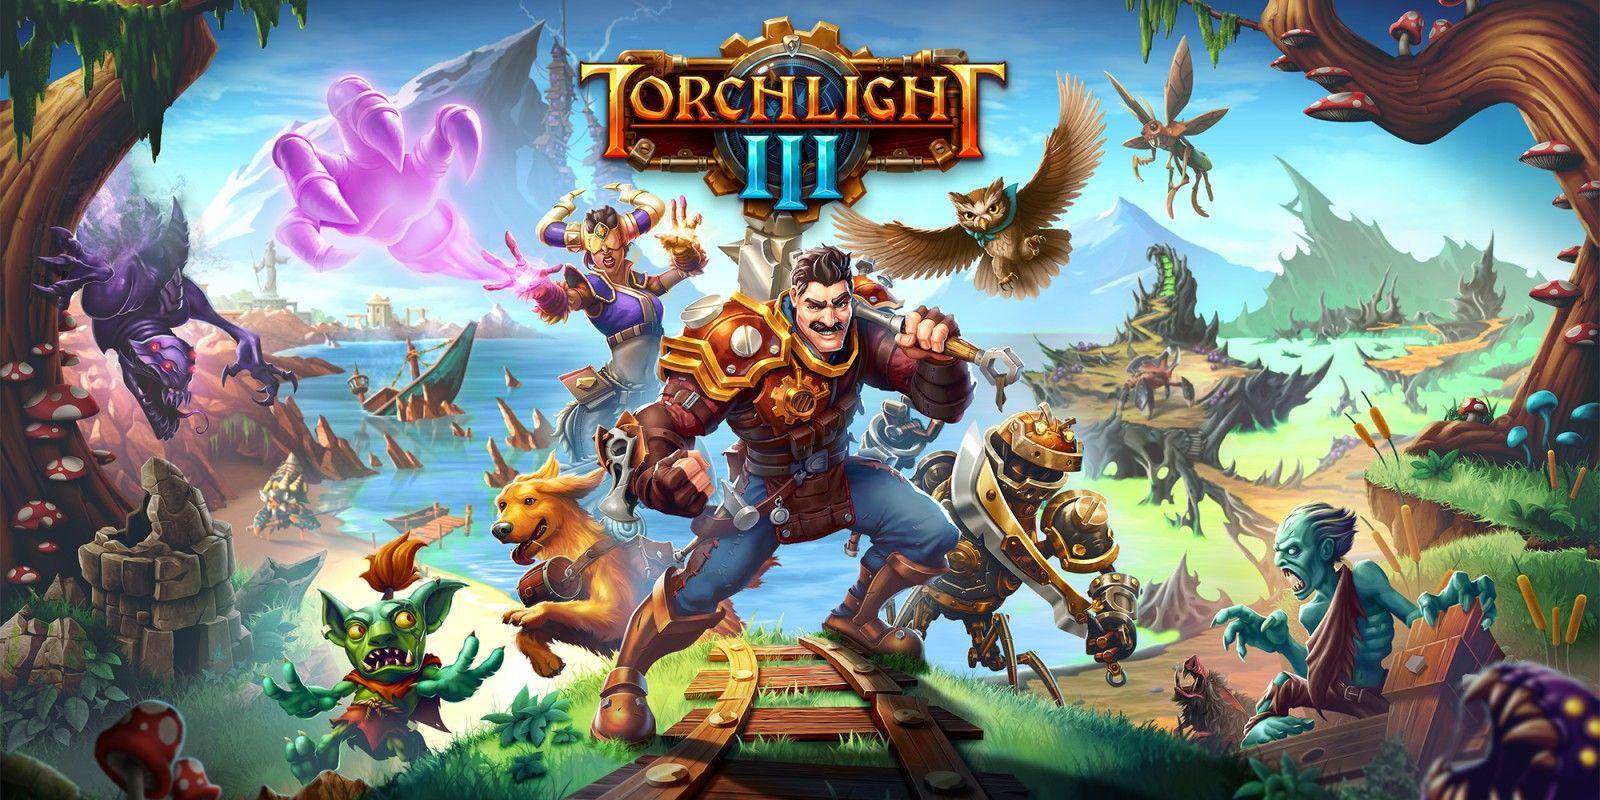 Jeu Torchlight III sur Nintendo Switch (Dématérialisé)